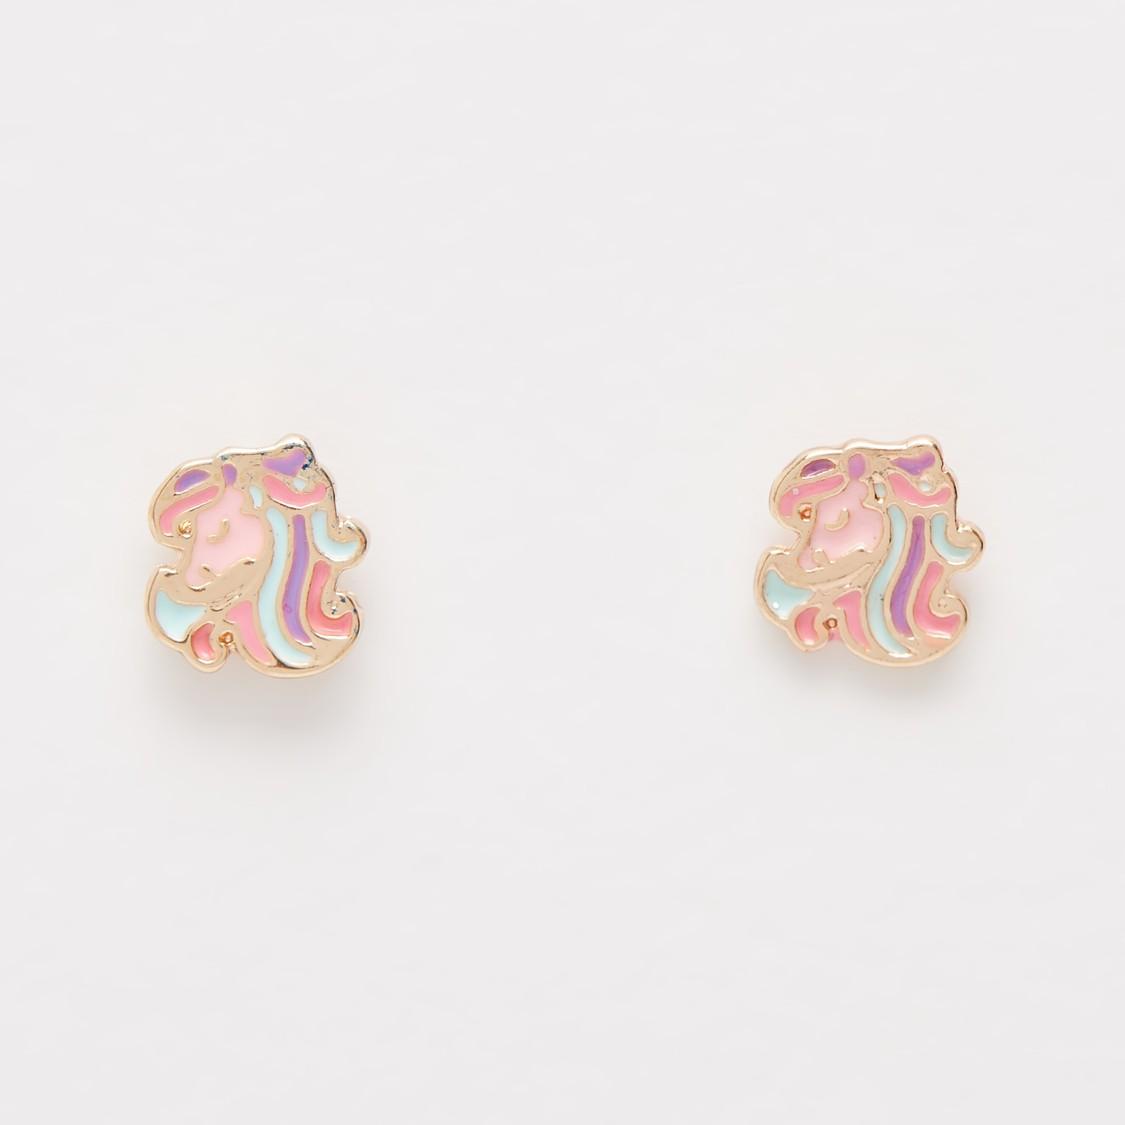 4-Piece Enamel Plated Unicorn Accent Jewellery Set